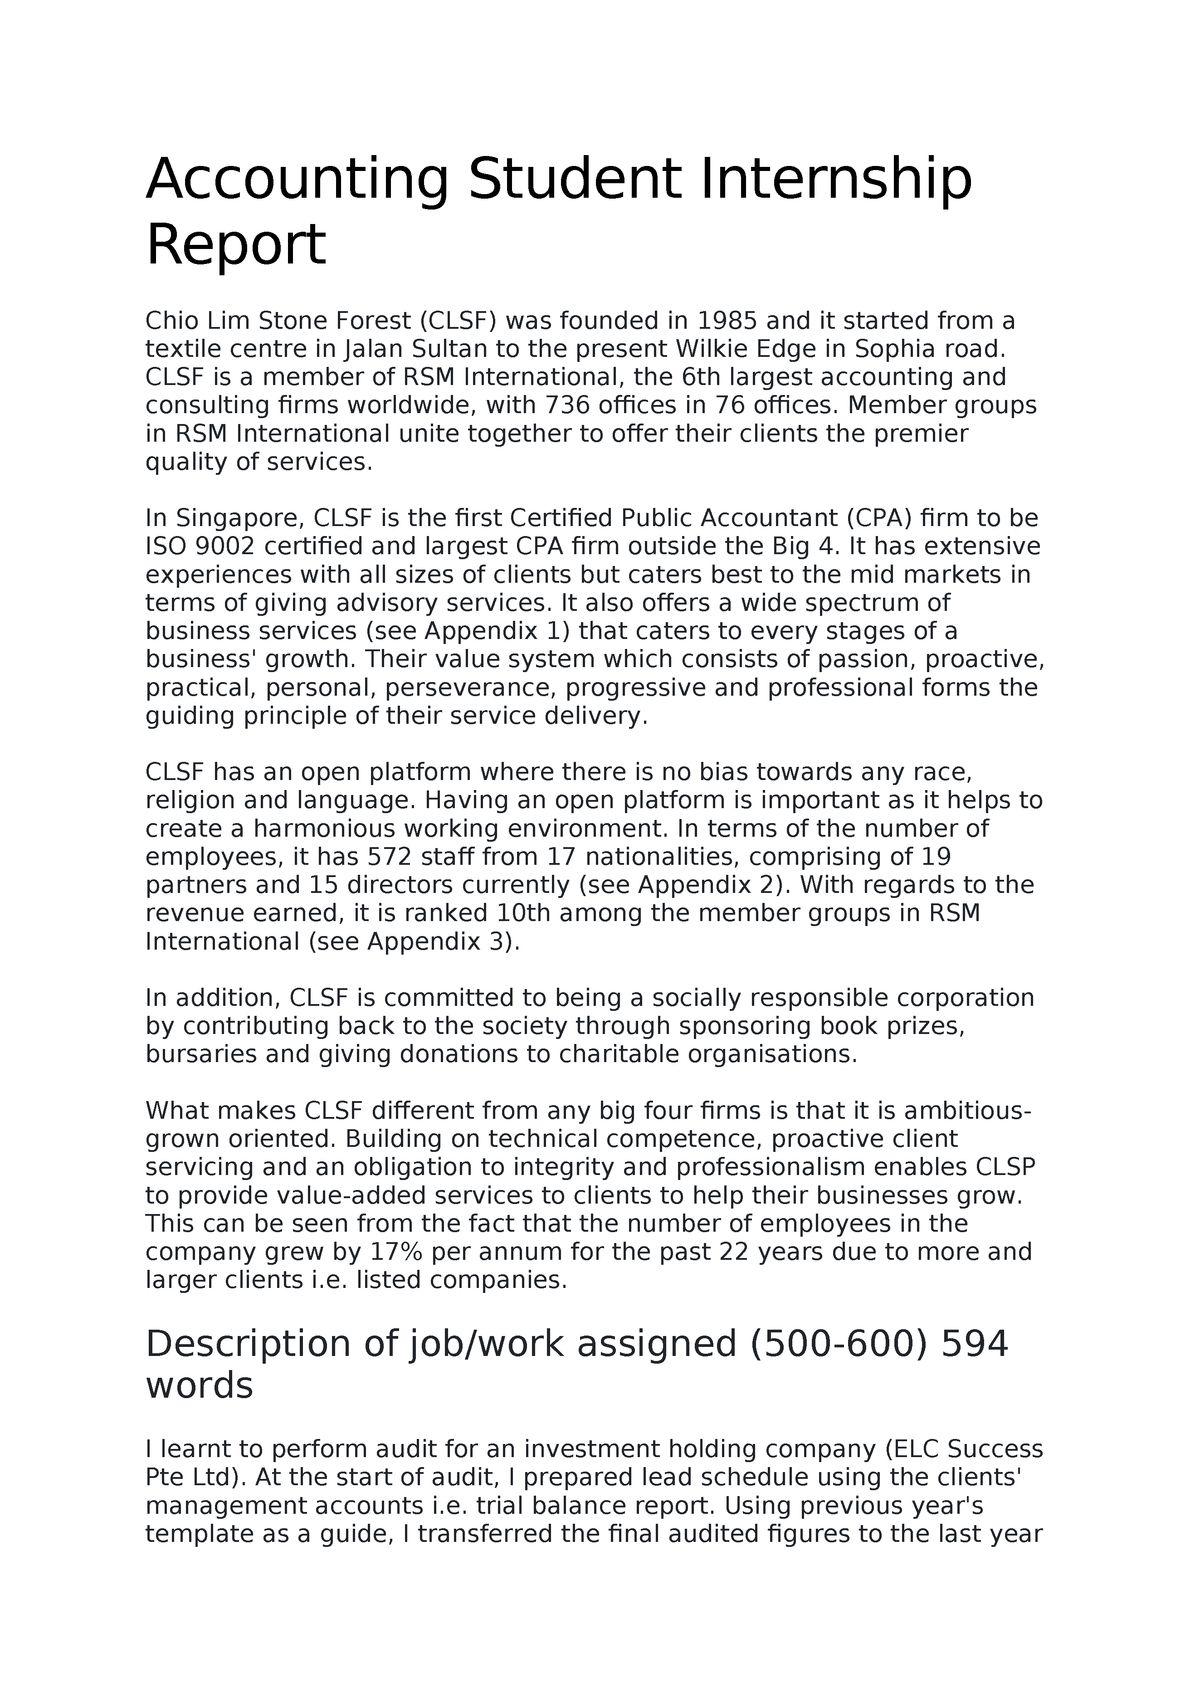 Accounting Student Internship Report Bcu Studocu In After